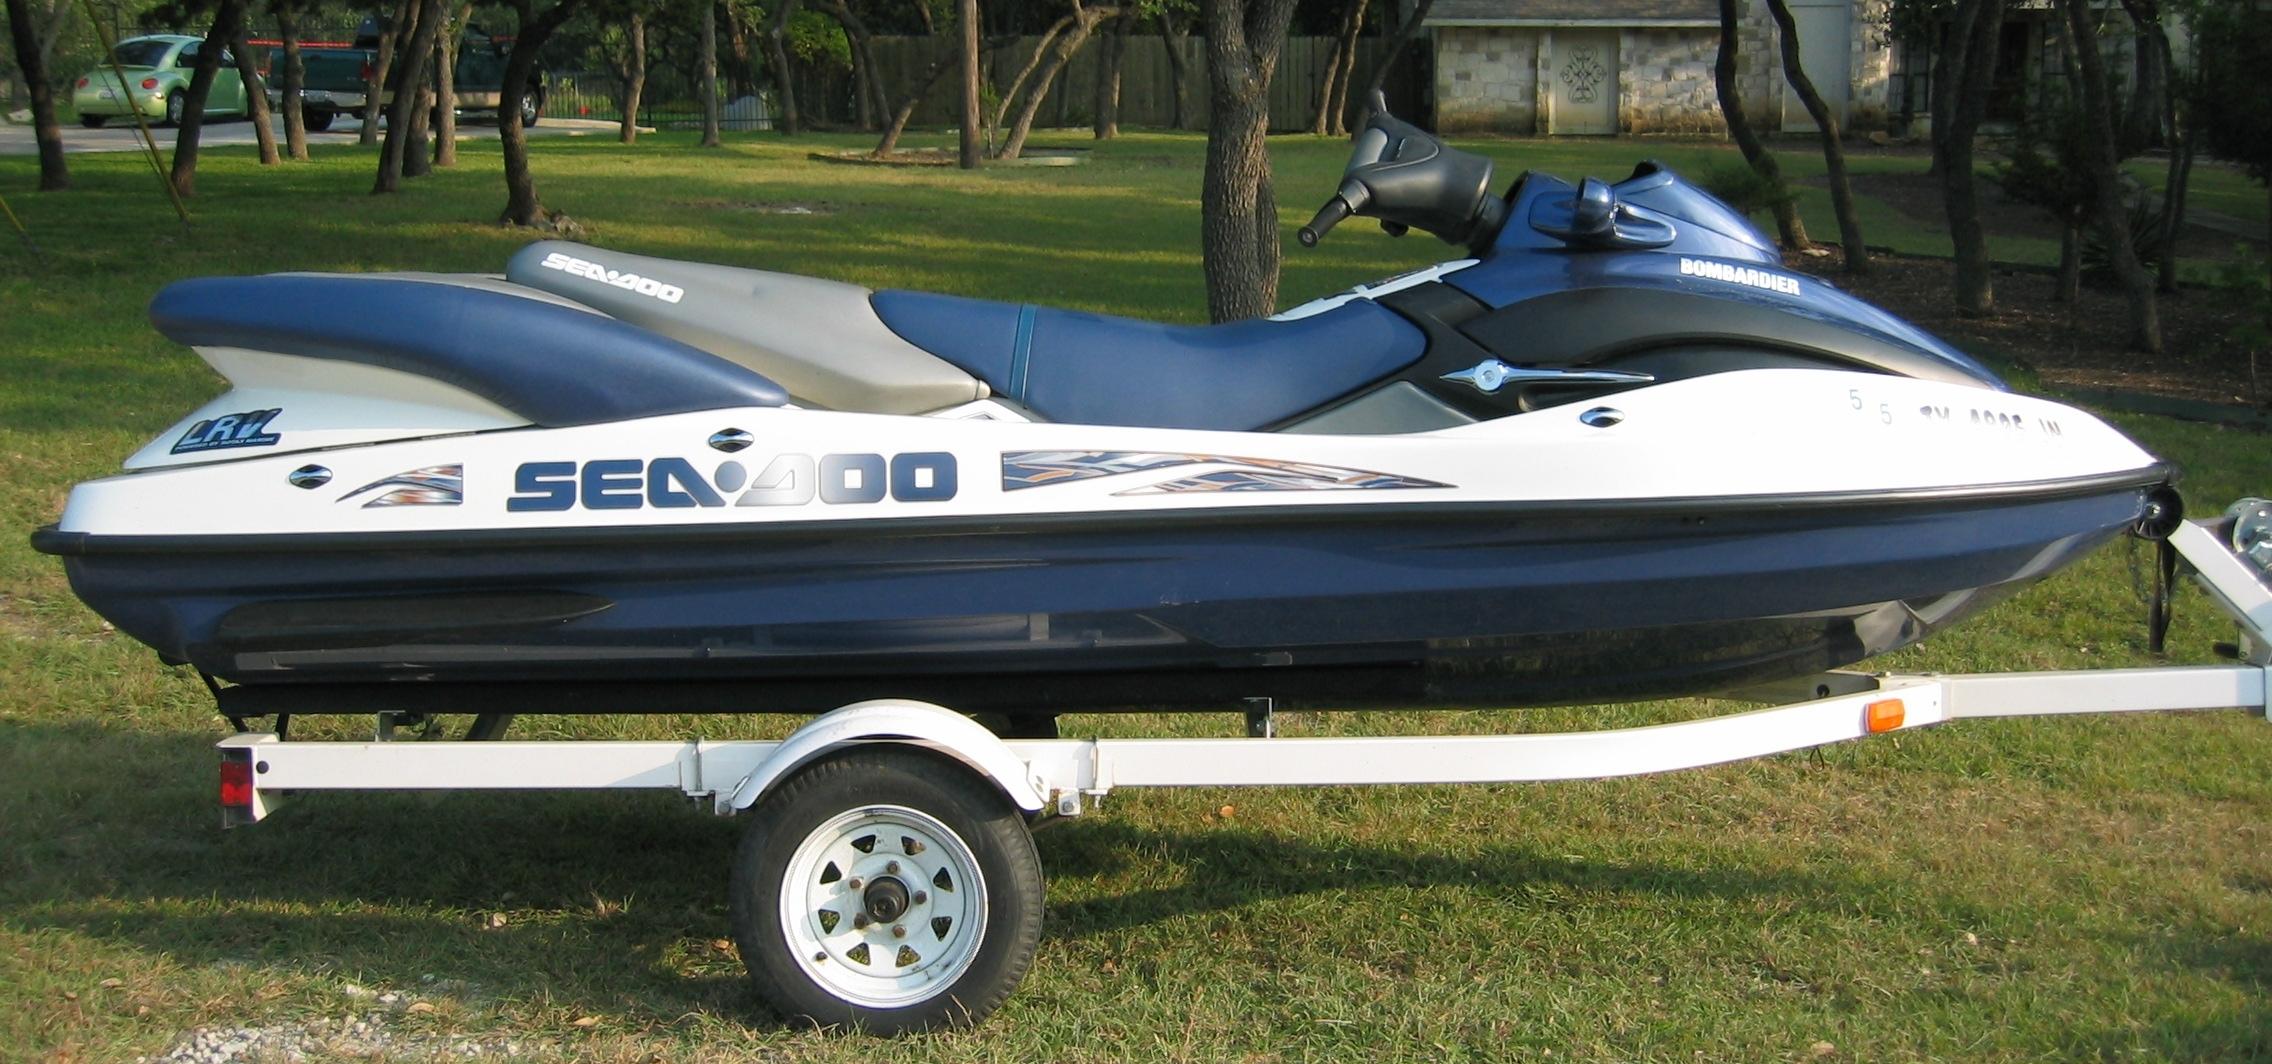 Photos of Seadoo Jet Boat